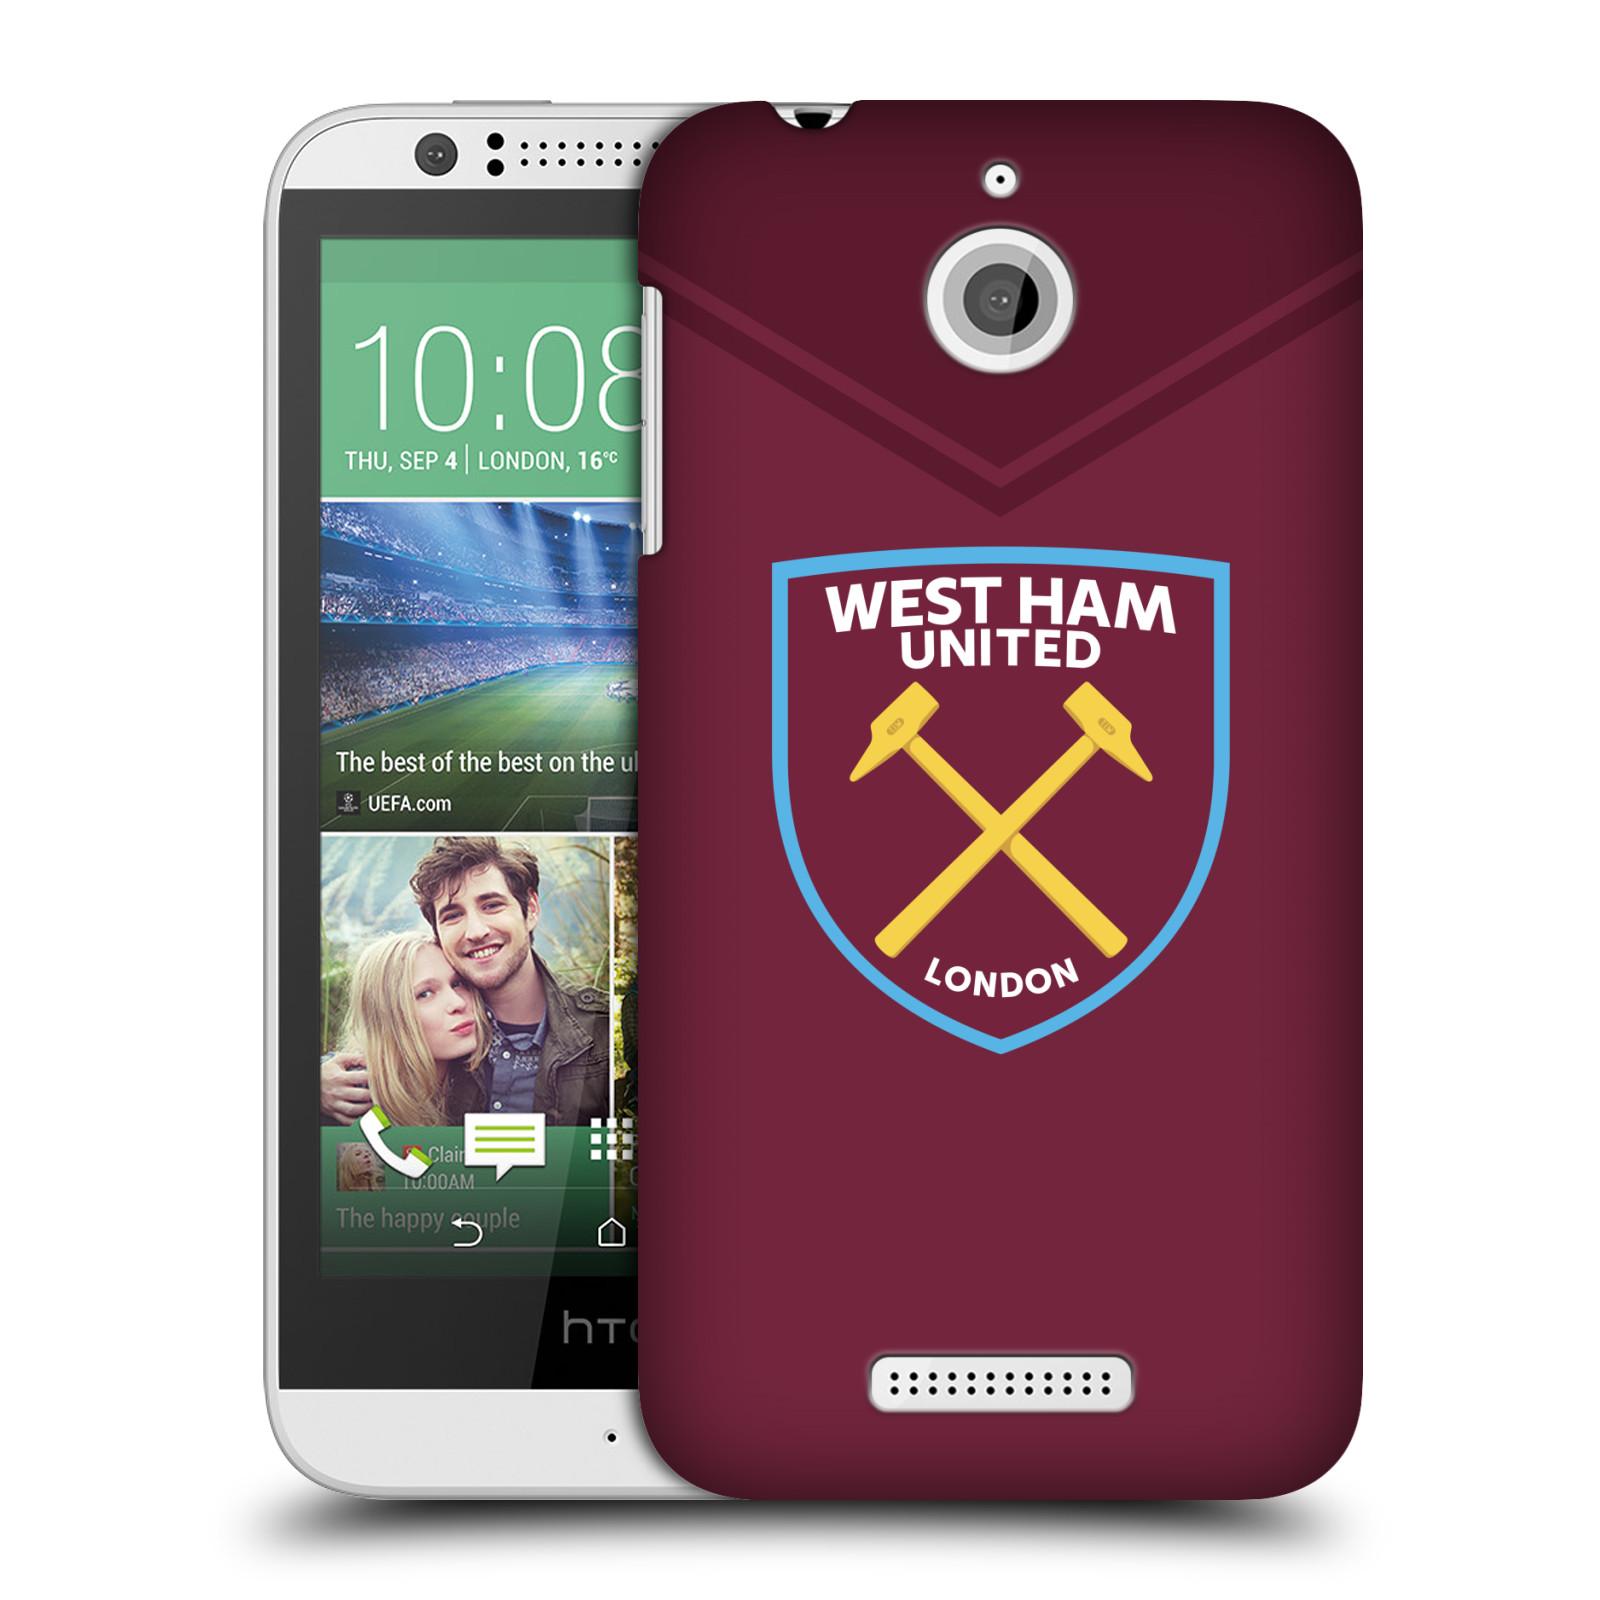 Plastové pouzdro na mobil HTC Desire 510 - Head Case - West Ham United - Logo